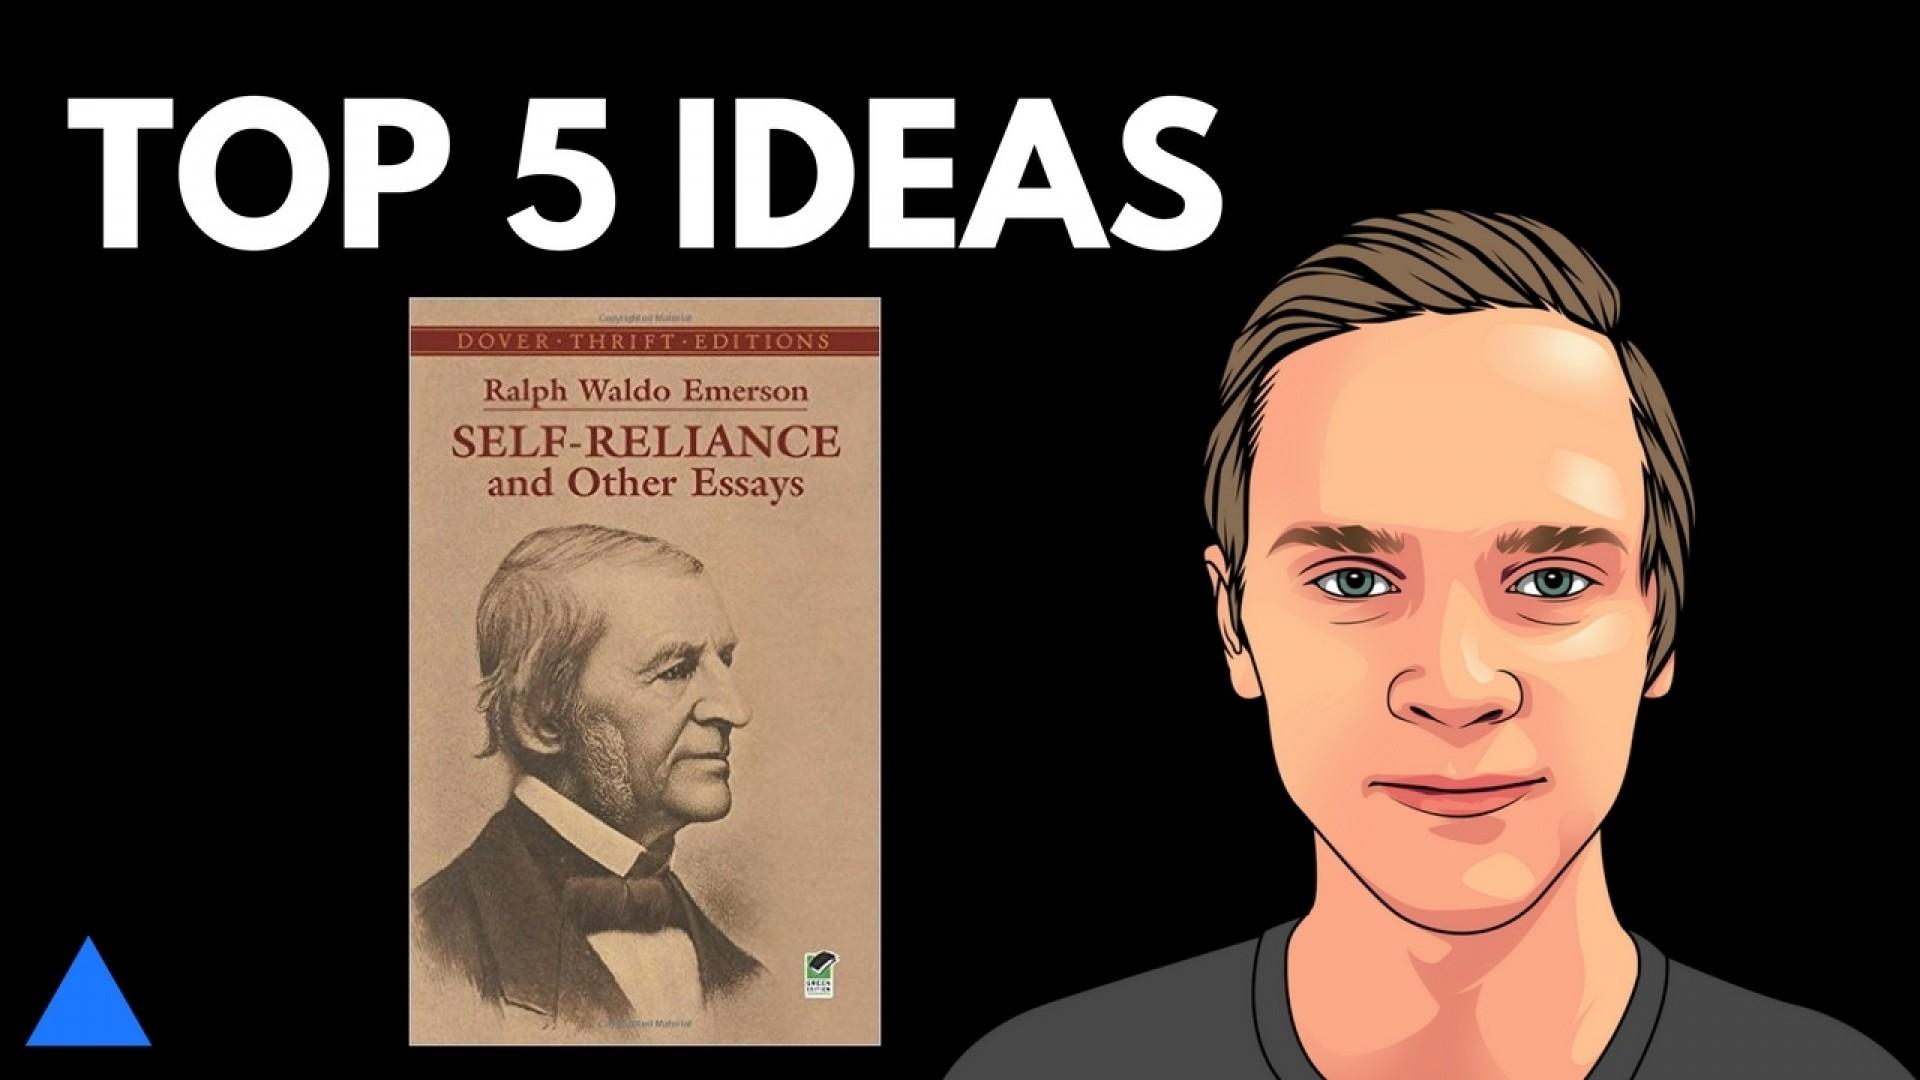 006 Self Reliance And Other Essays Maxresdefault Essay Formidable Ralph Waldo Emerson Pdf Ekşi 1920